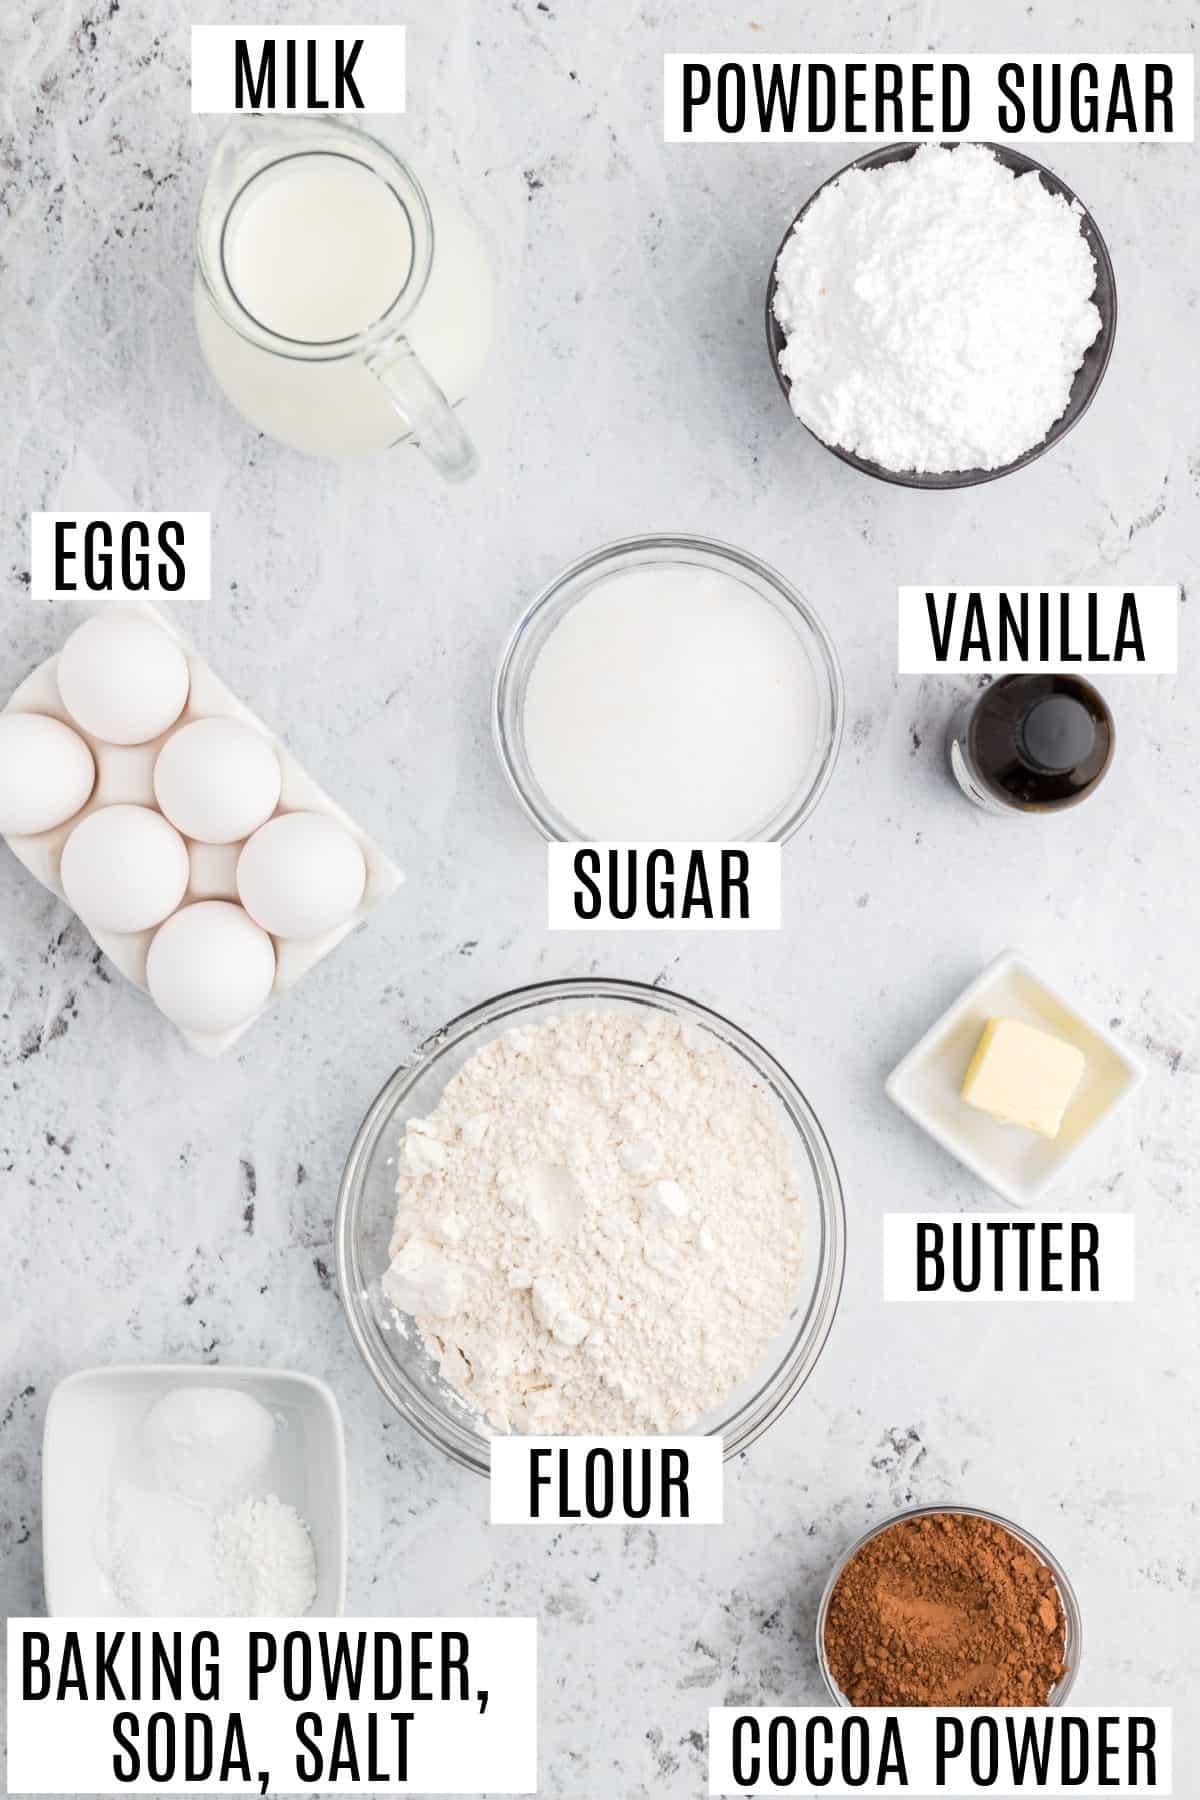 Ingredients needed to make chocolate glazed donut holes.